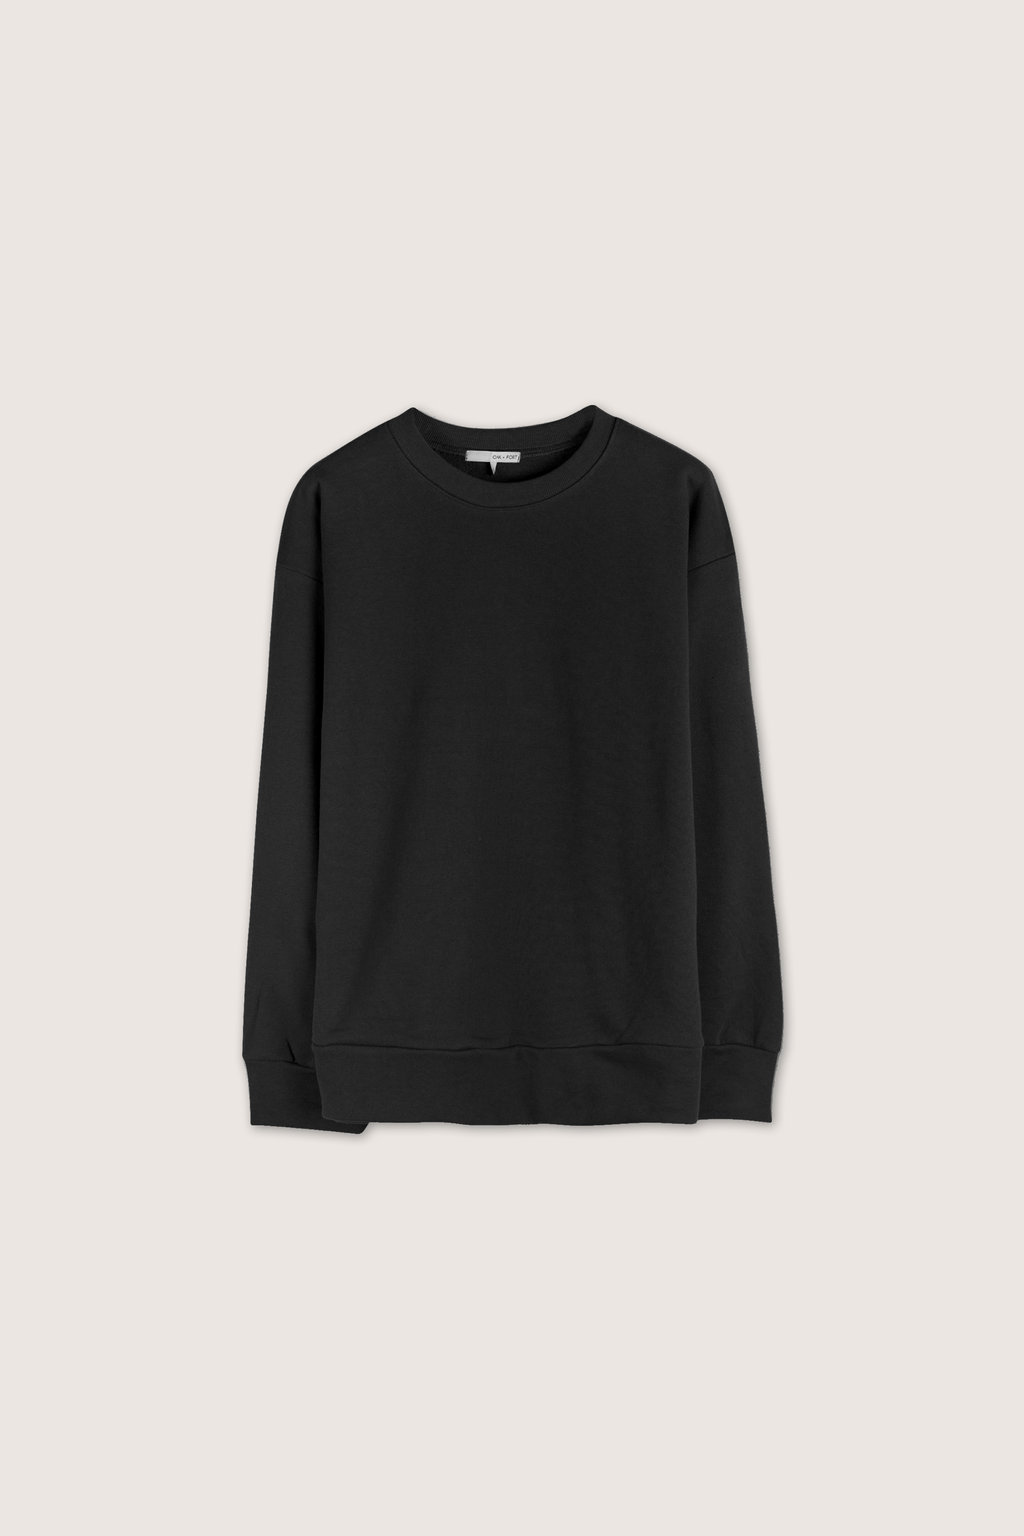 Sweatshirt H360 Black 12